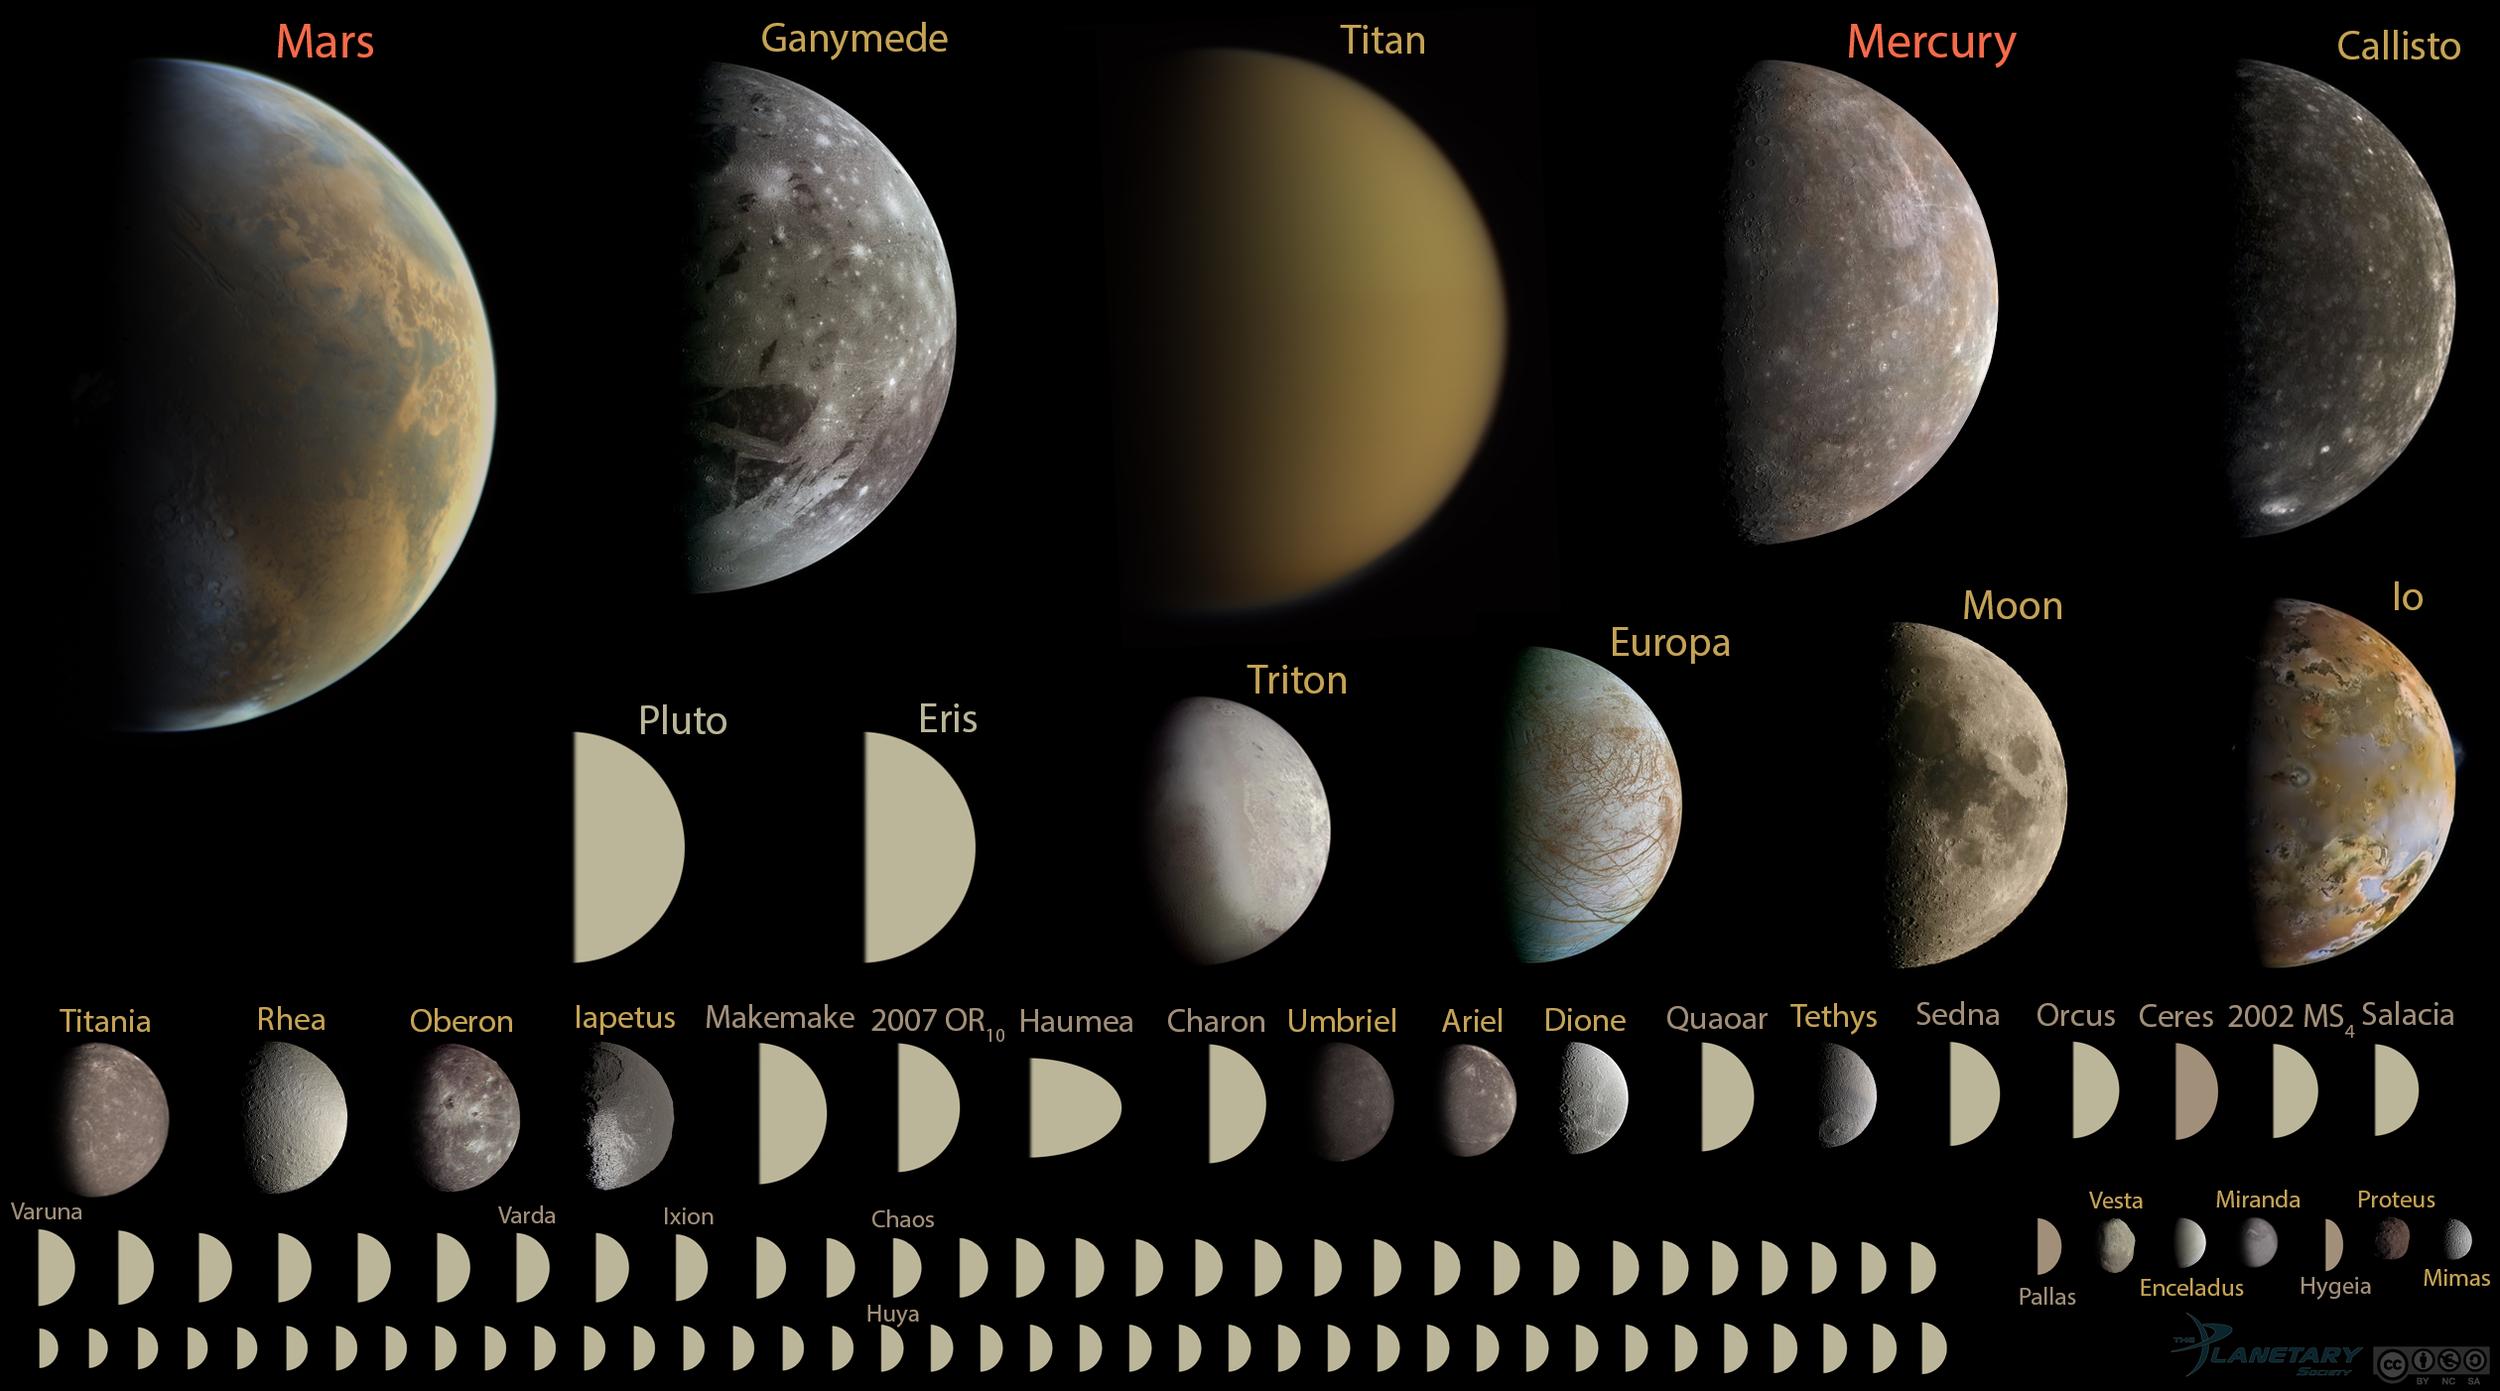 Montage of every round object in the solar system under 10,000 kilometers in diameter, to scale. - Image Credit: Emily Lakdawalla/data from NASA /JPL/JHUAPL/SwRI/SSI/UCLA/MPS/DLR/IDA/Gordan Ugarkovic/Ted Stryk, Bjorn Jonsson/Roman Tkachenko